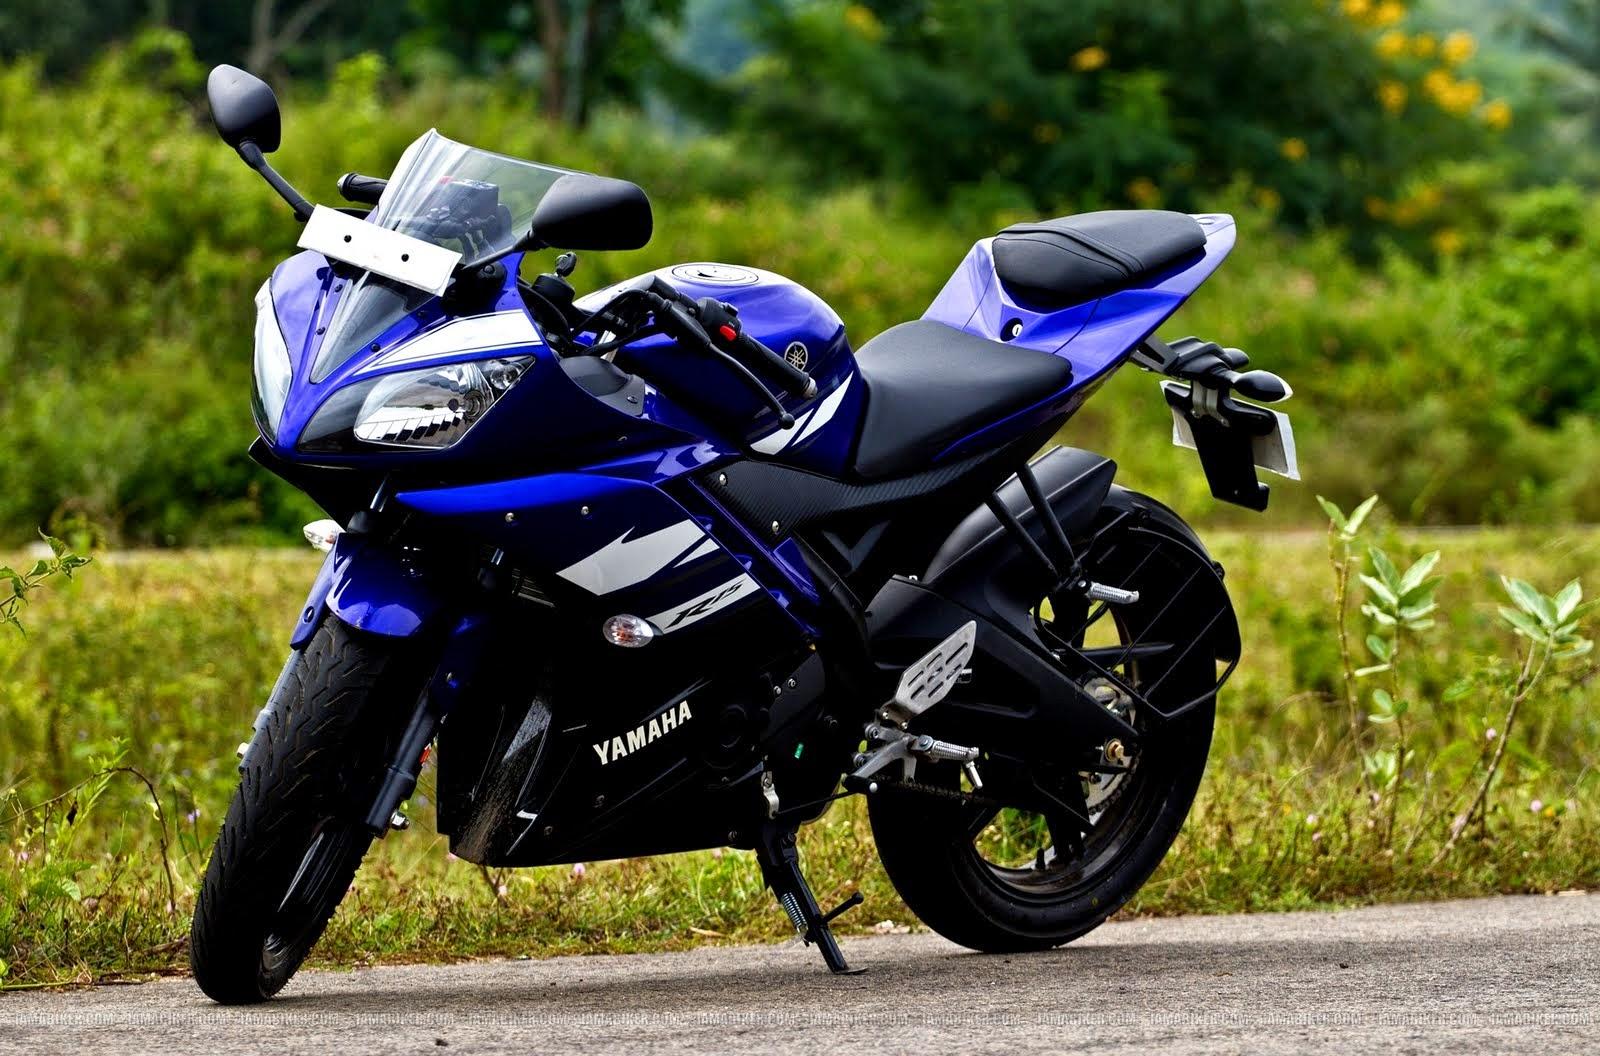 Harga Yamaha R15 - Otogrezz